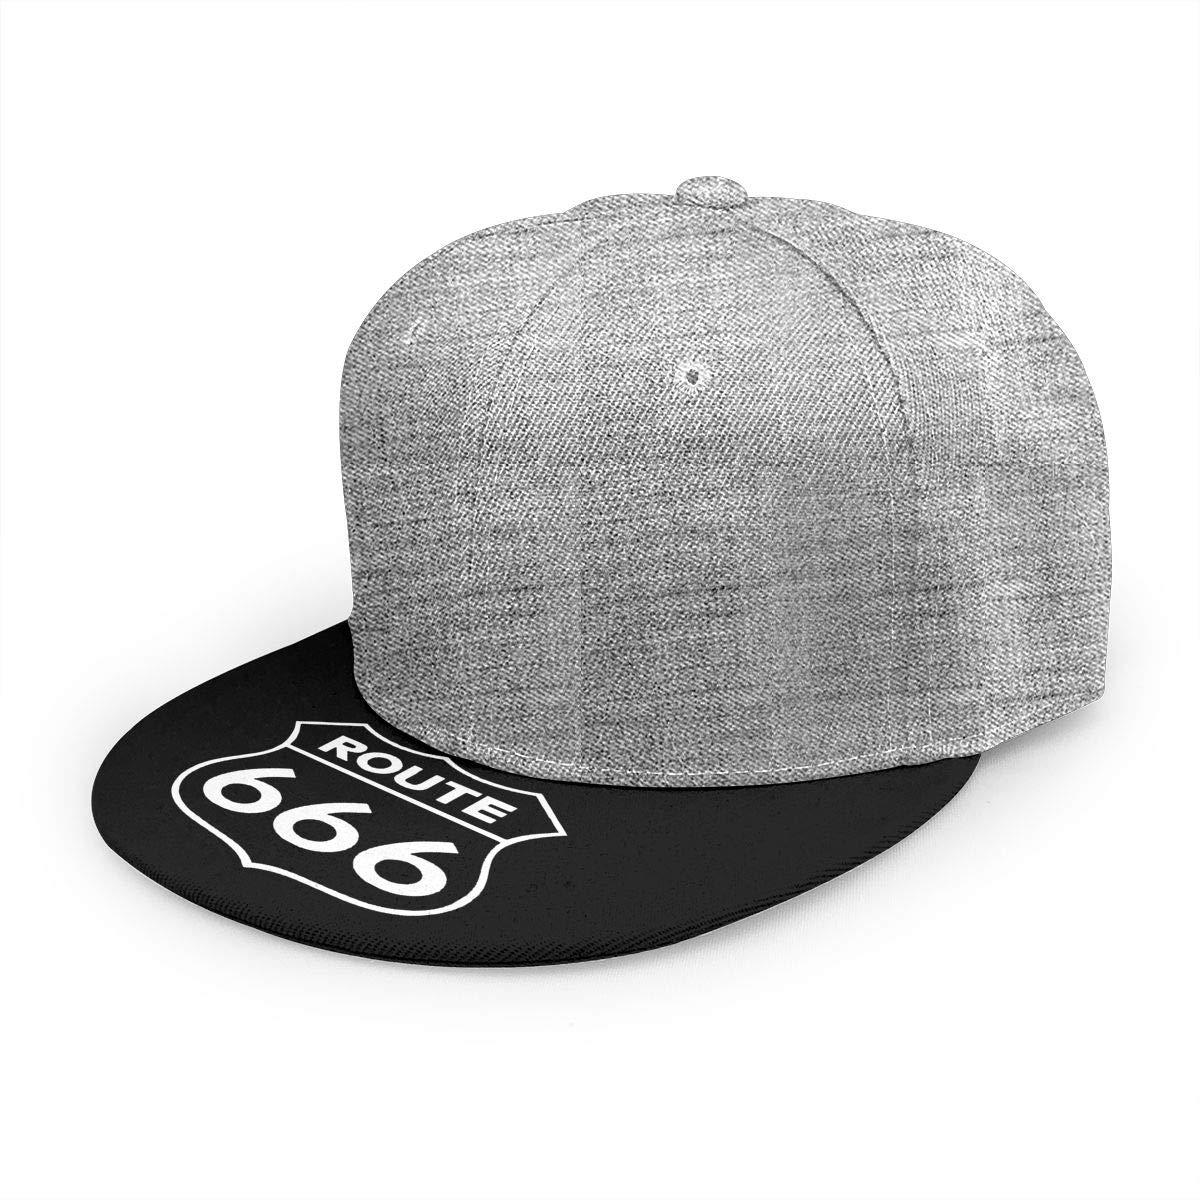 Adjustable Women Men Route 666 Print Baseball Cap Flat Brim Cap Hats Hip Hop Snapback Sun Hat Boys Girls Gray by Apolonia